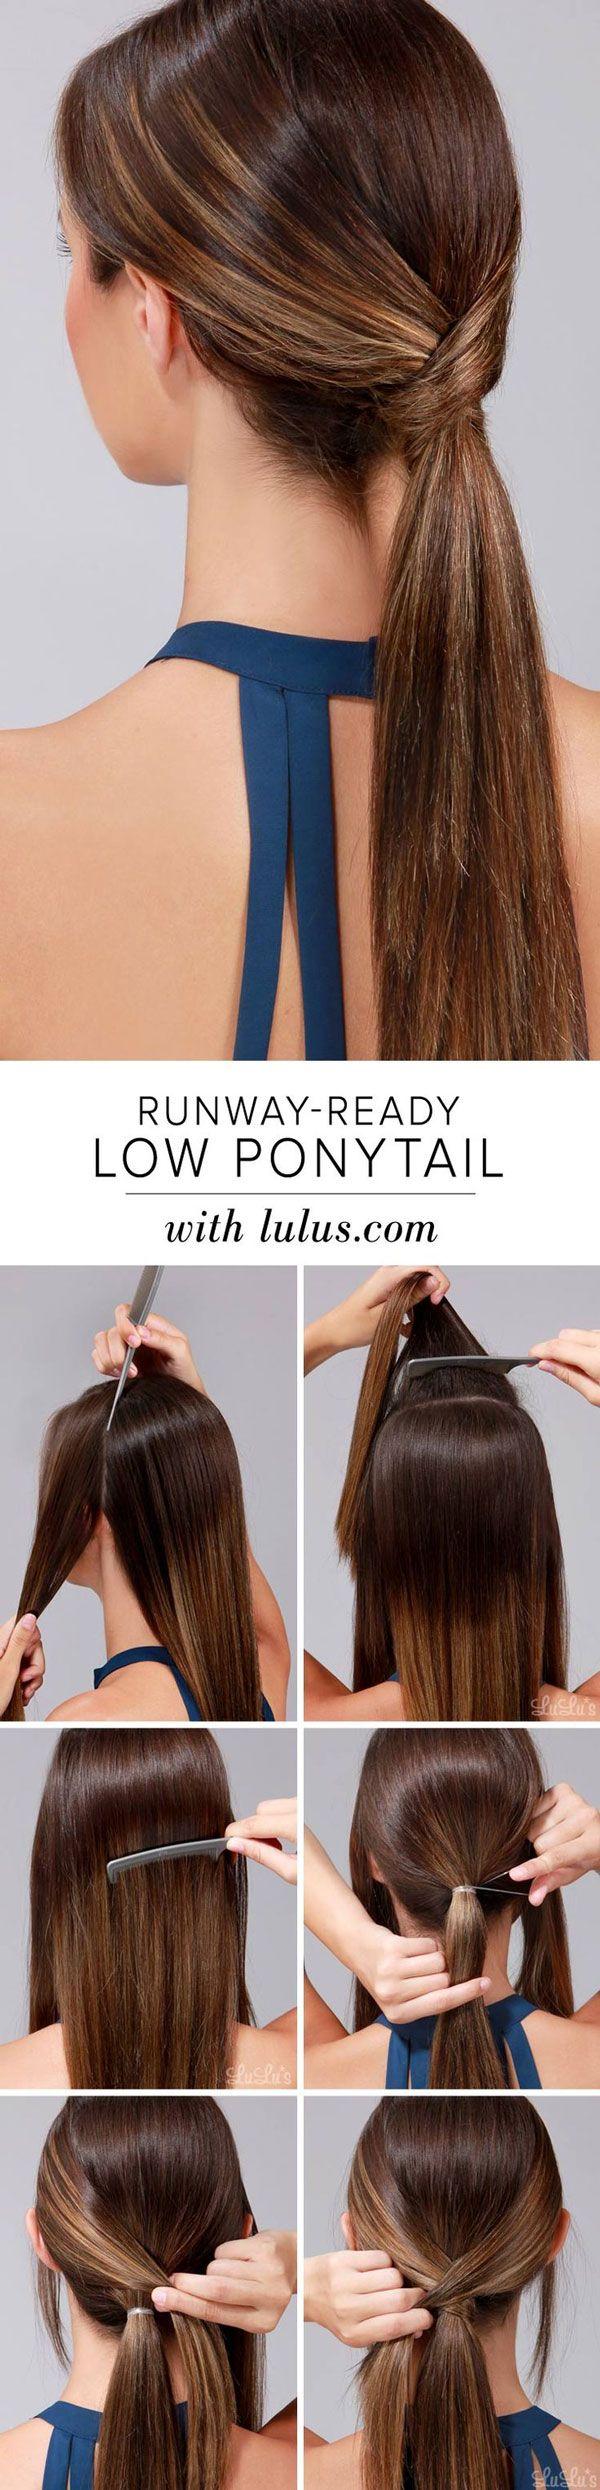 Top 10 Holiday Hair Tutorials On Pinterest Thefashionspot Hair Styles Medium Length Hair Styles Low Ponytail